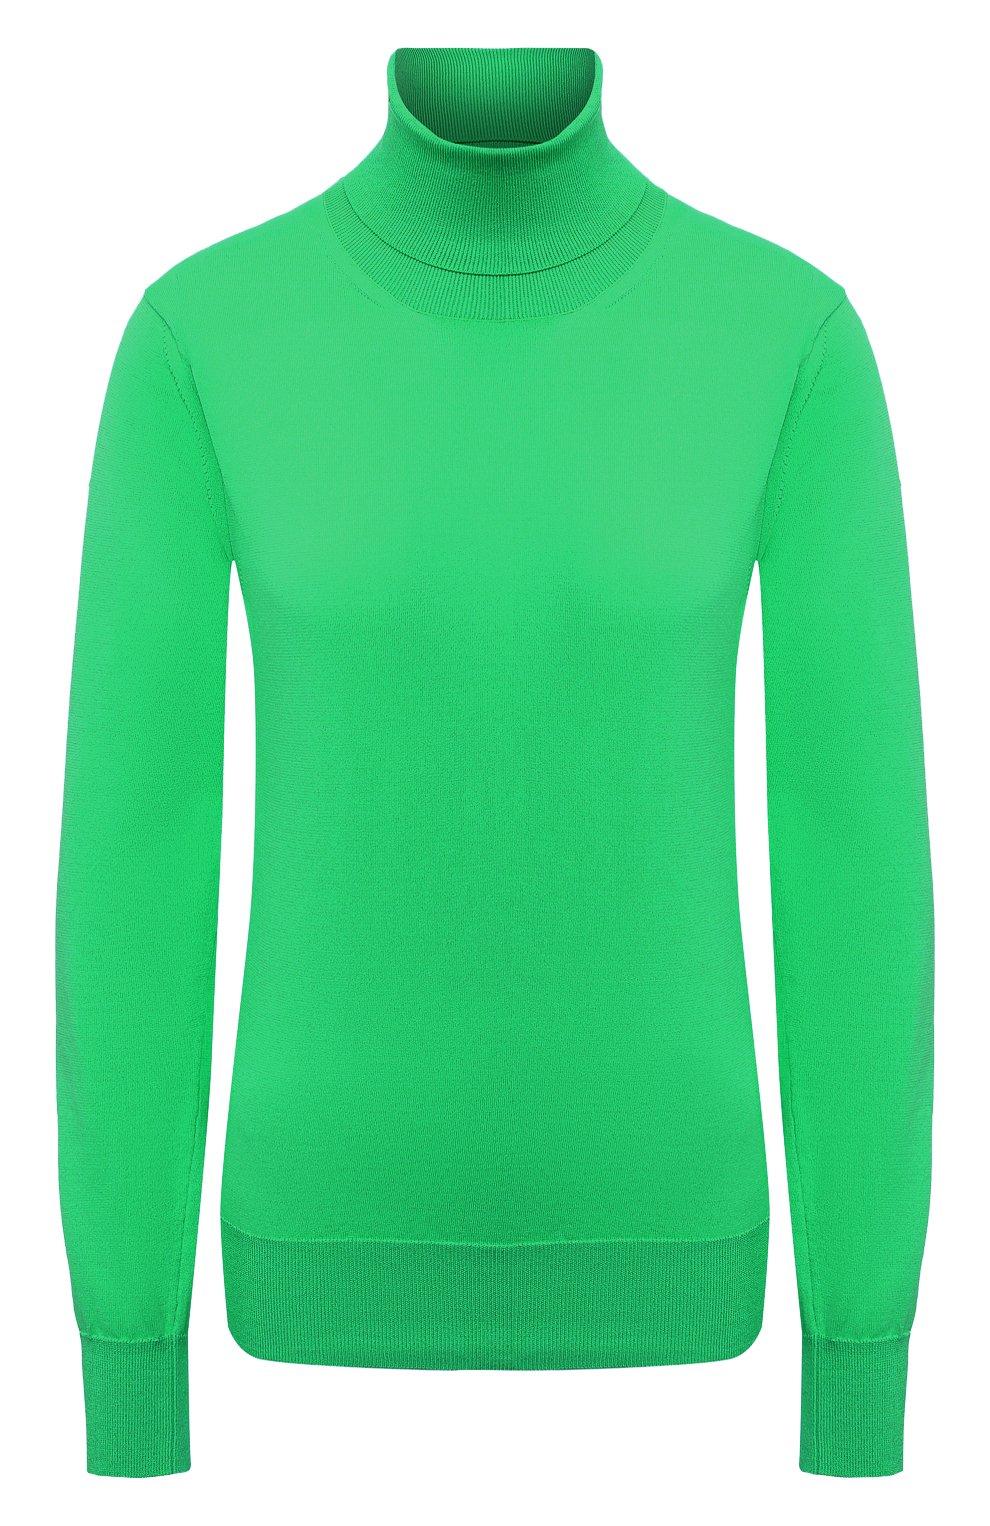 Женская водолазка TOM FORD зеленого цвета, арт. MAK1031-YAX283 | Фото 1